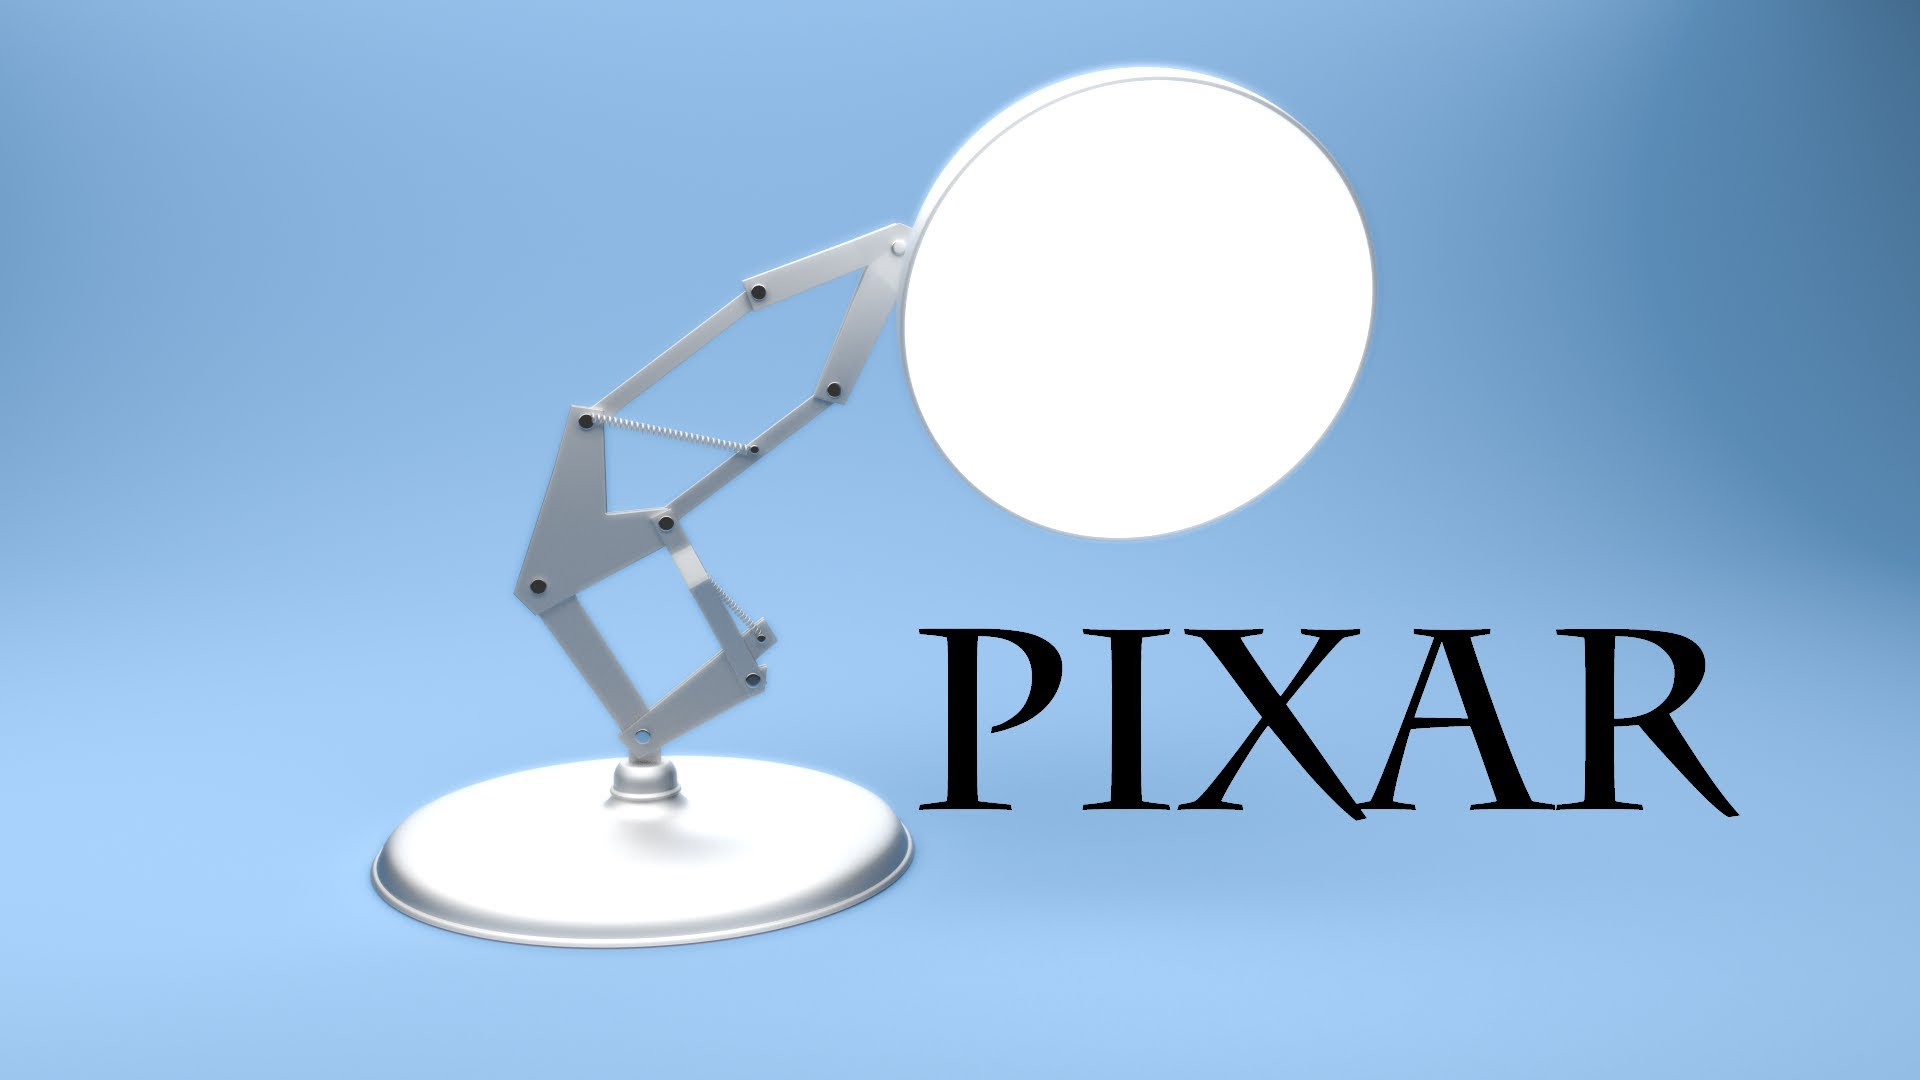 pixar lamp 10 reasons to buy warisan lighting. Black Bedroom Furniture Sets. Home Design Ideas